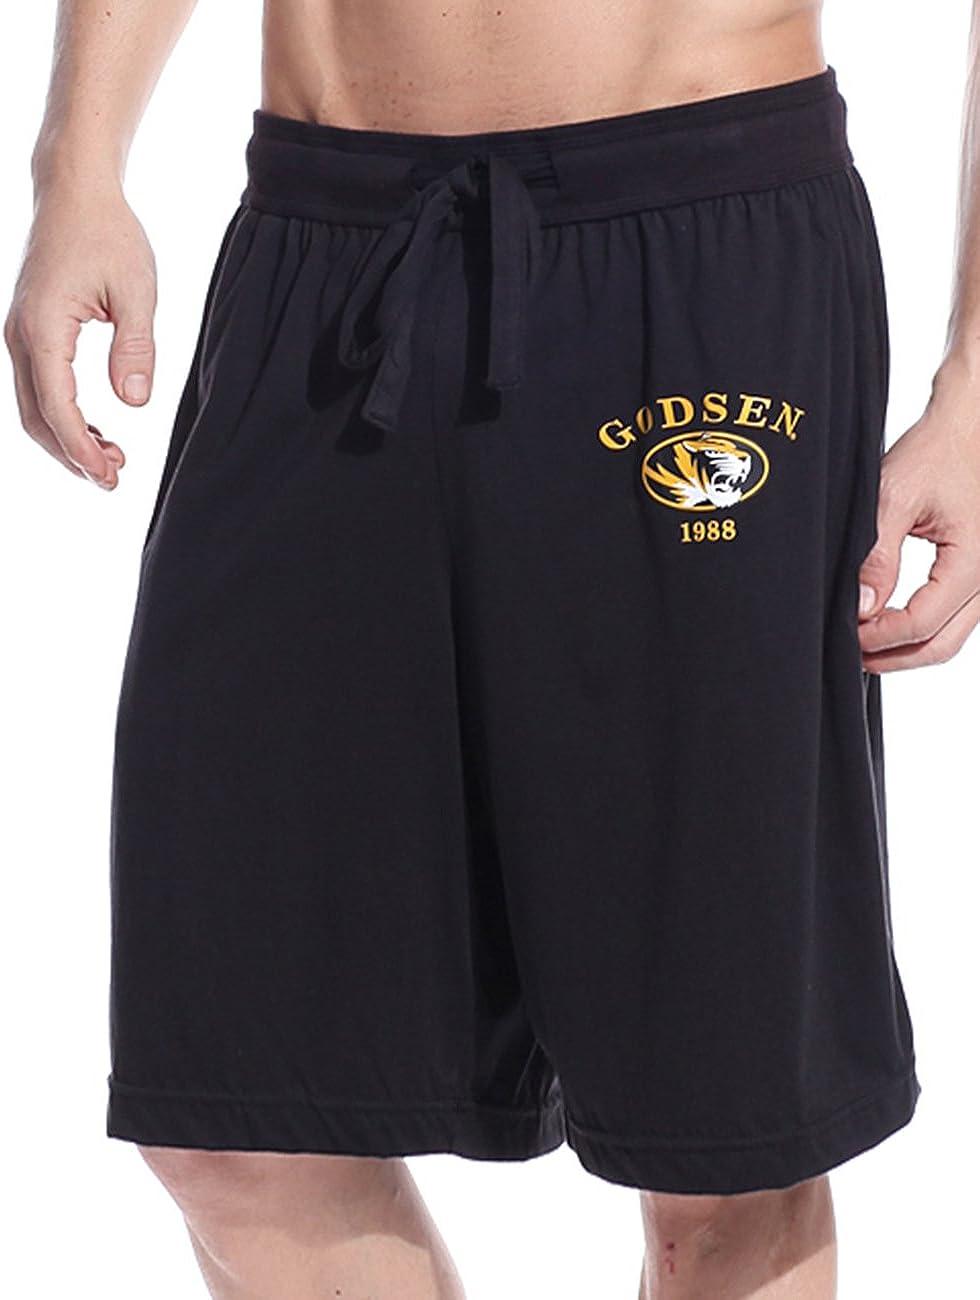 Godsen Mens Cotton Casual Shorts Sports Shorts Beach Short